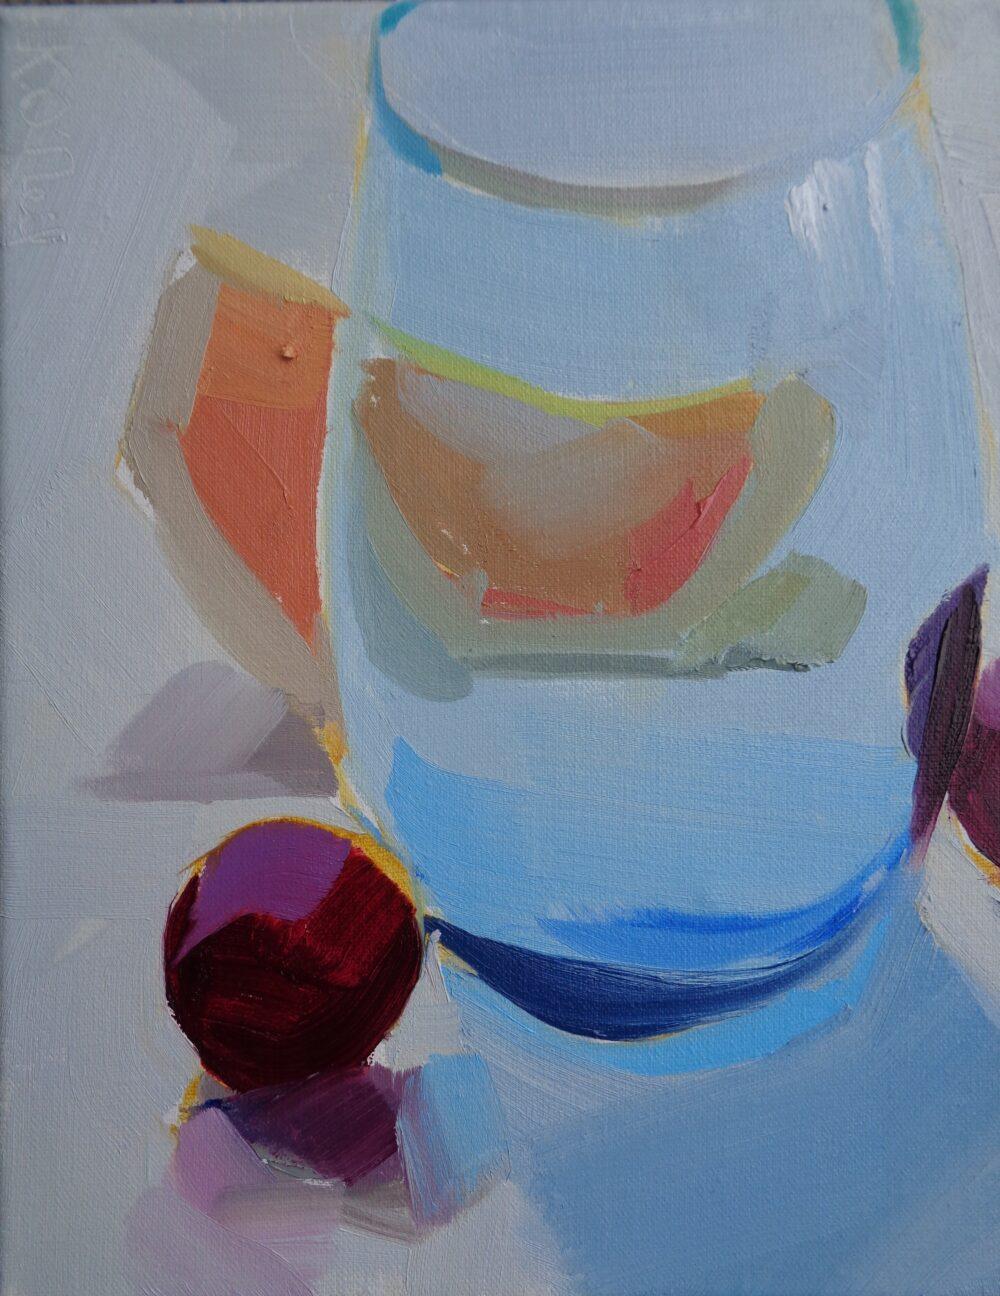 Karen O'Neil - Blue Glass and Cherries